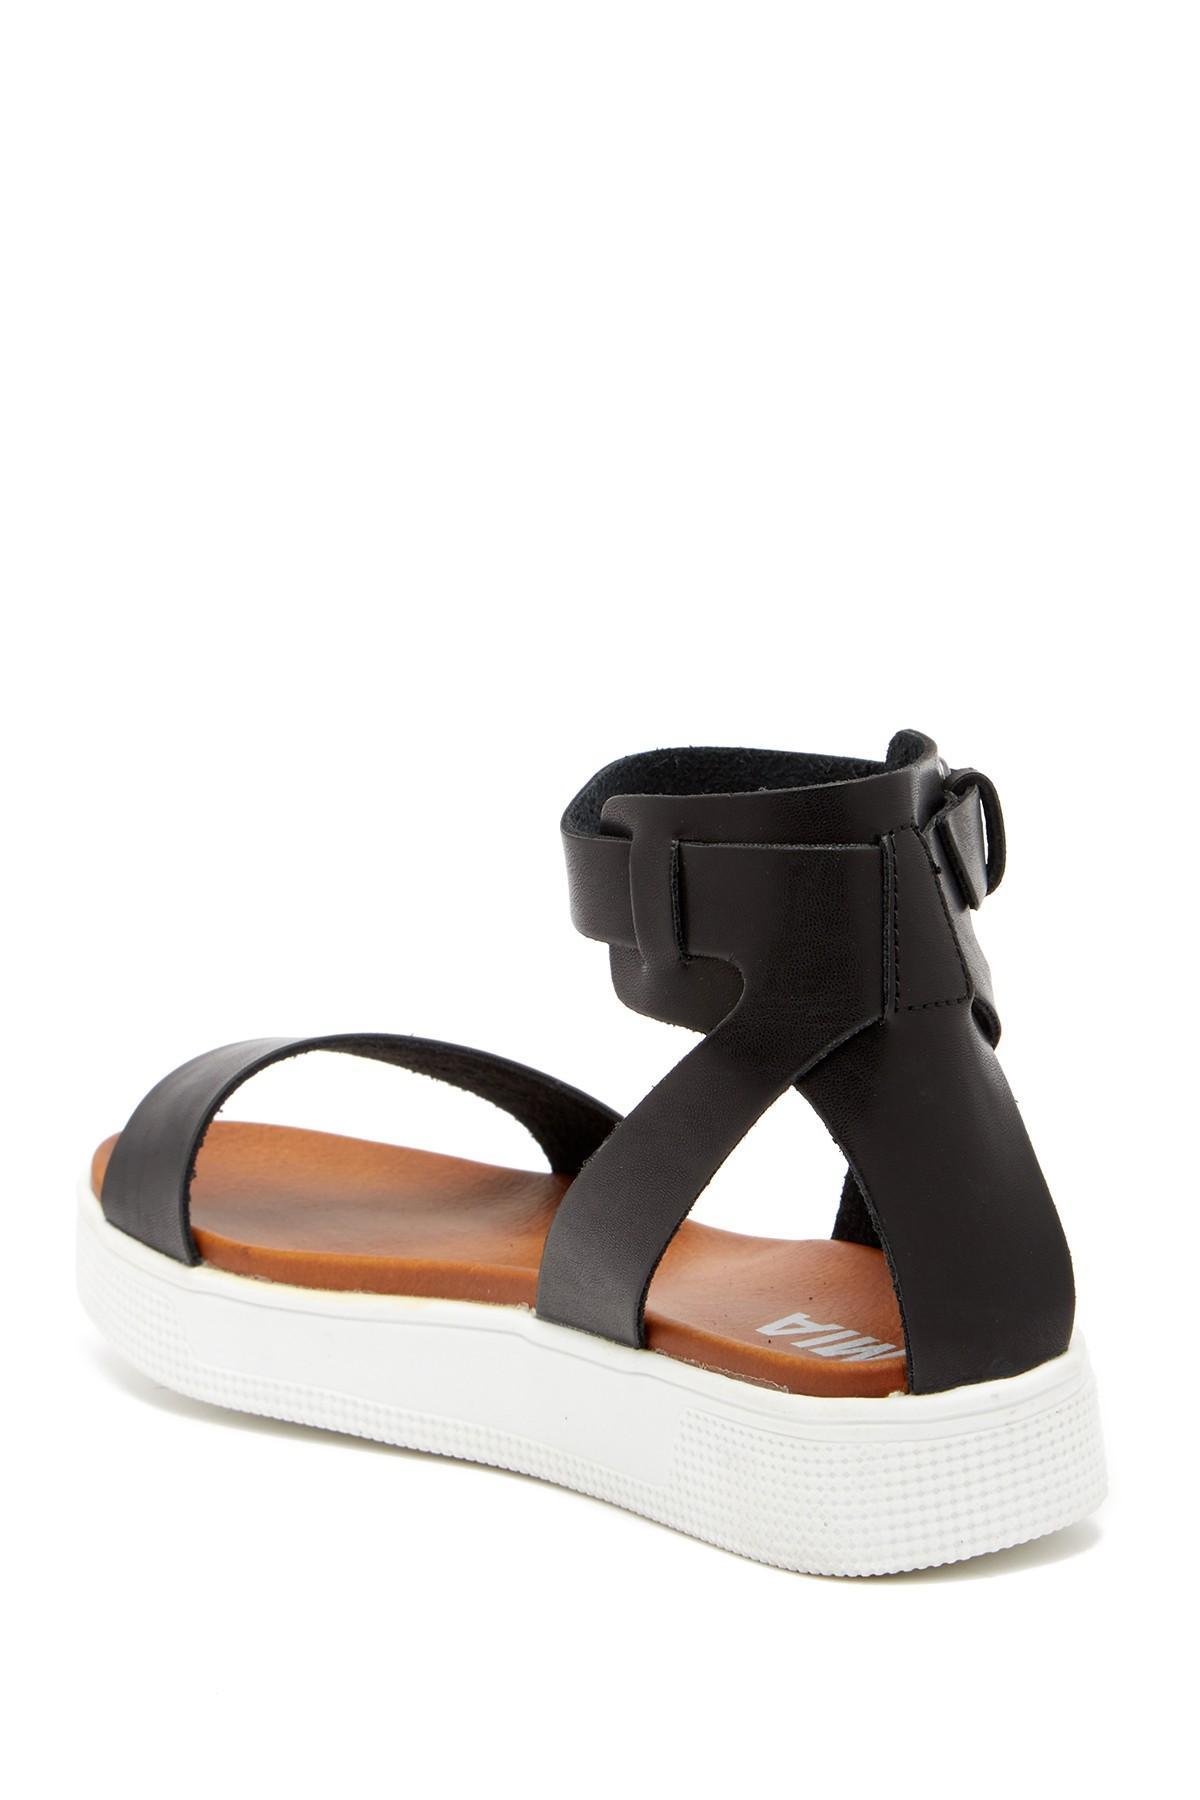 709b9c2fa26 MIA - Black Platform Sandal (women) - Lyst. View fullscreen